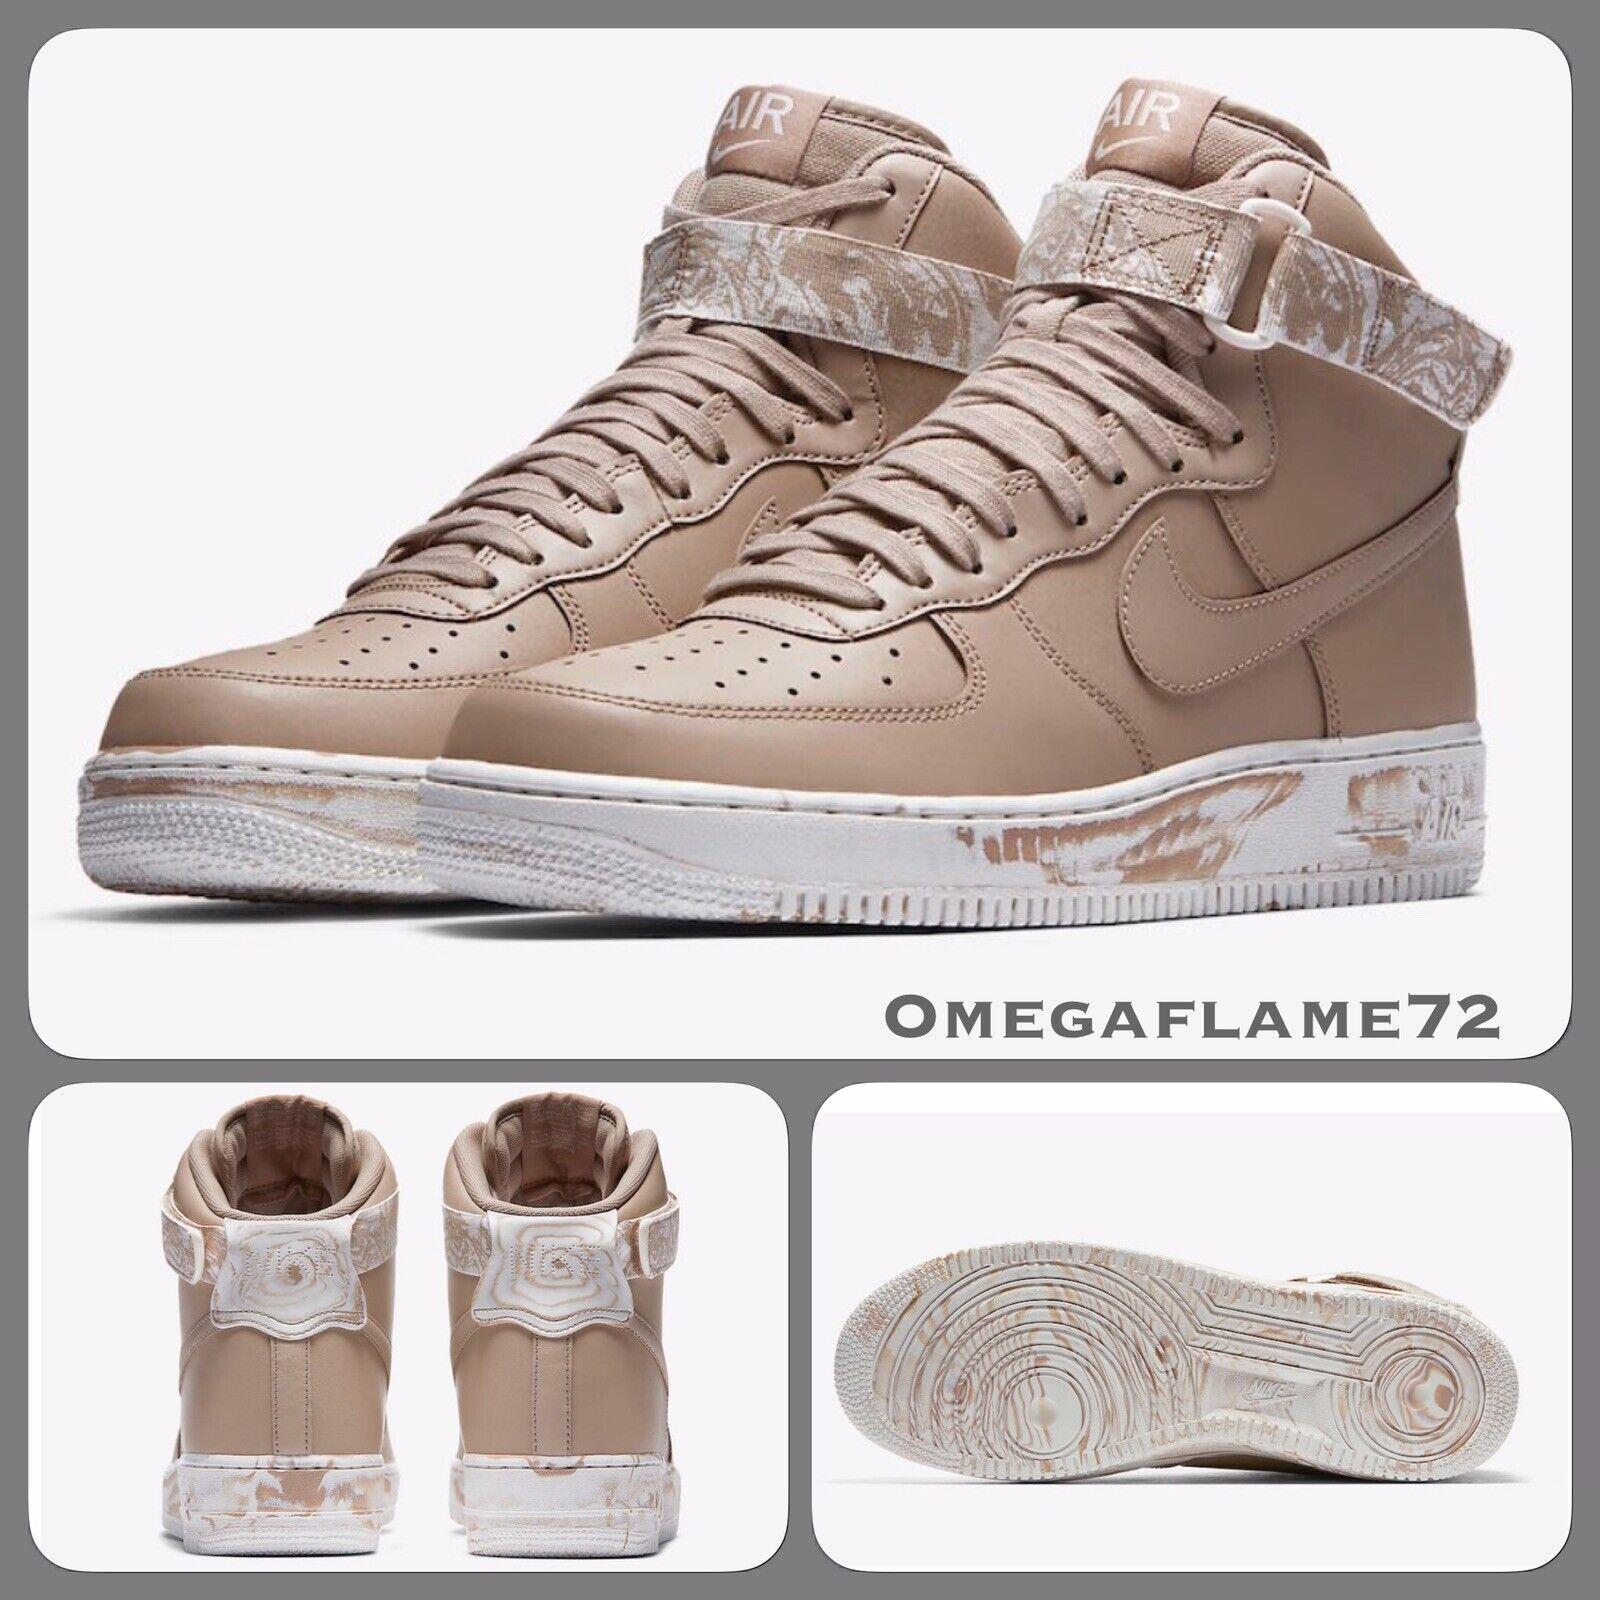 Nike Air Force 1 '07 '07 '07 HI  Marble Soles  Sz UK 8, EU 42.5, US 9, AT3293-299, AF-1 110